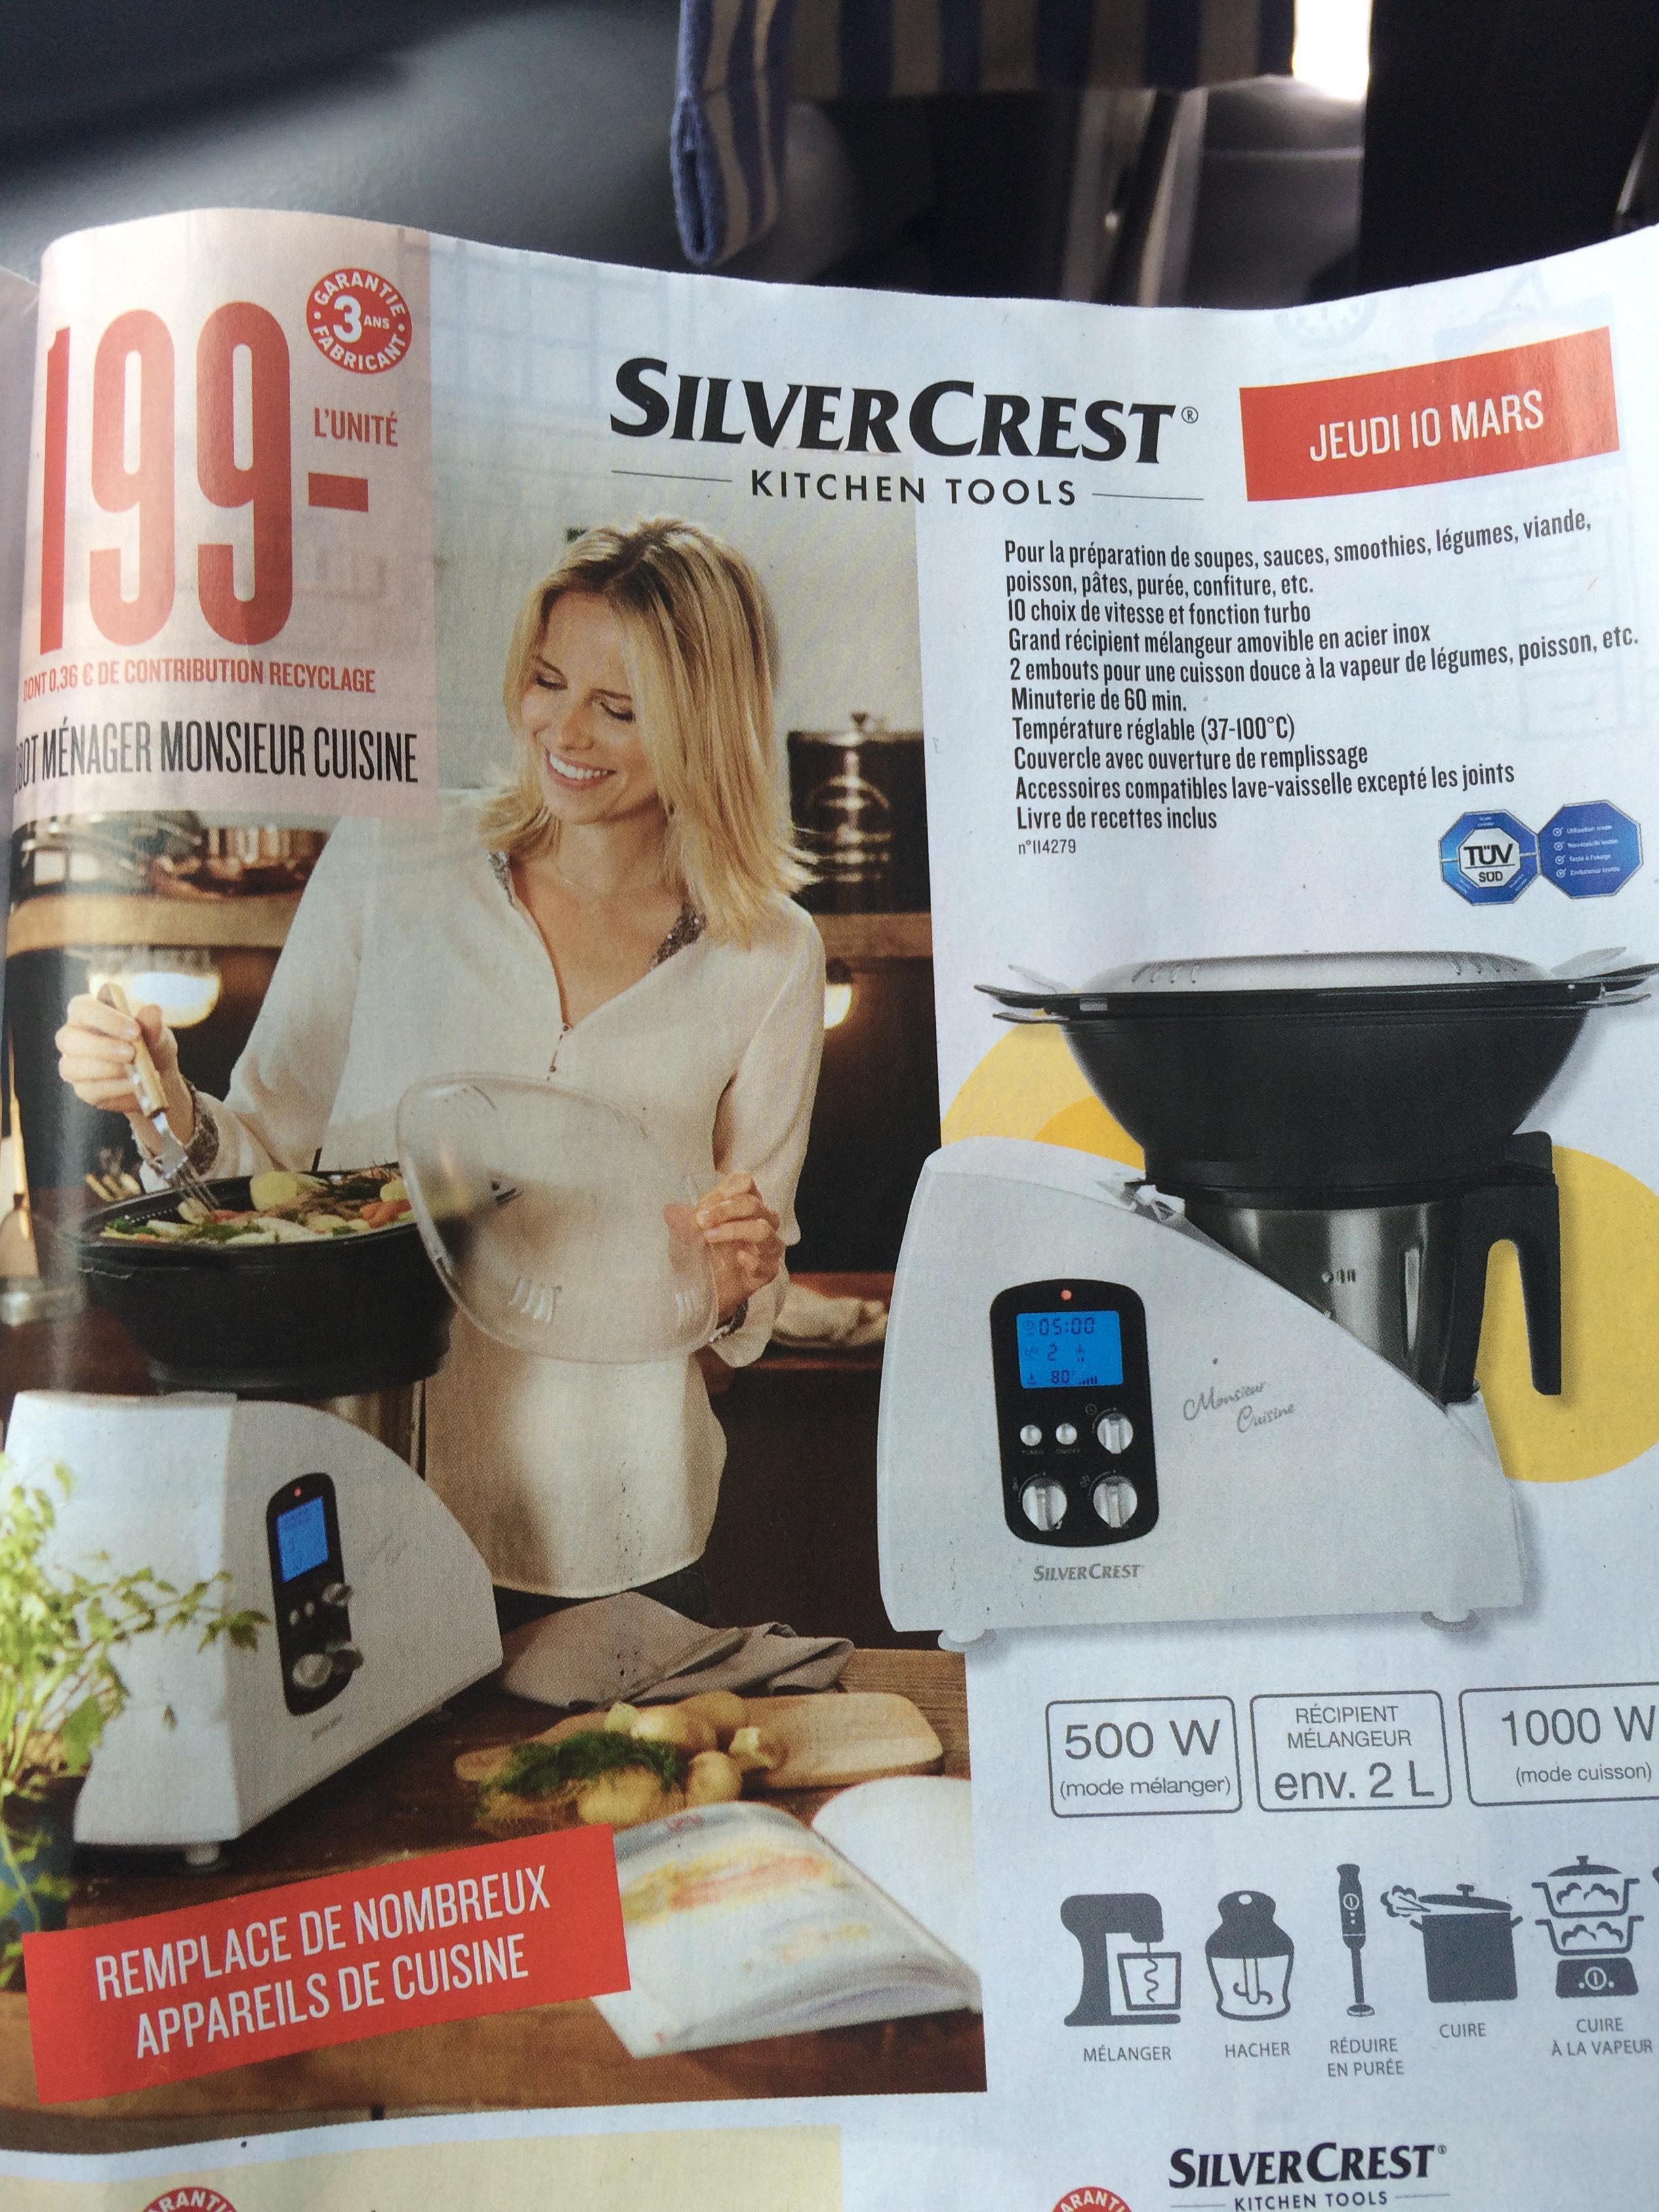 Robot m nager monsieur cuisine silvercrest 2l - Silvercrest robot cuisine ...